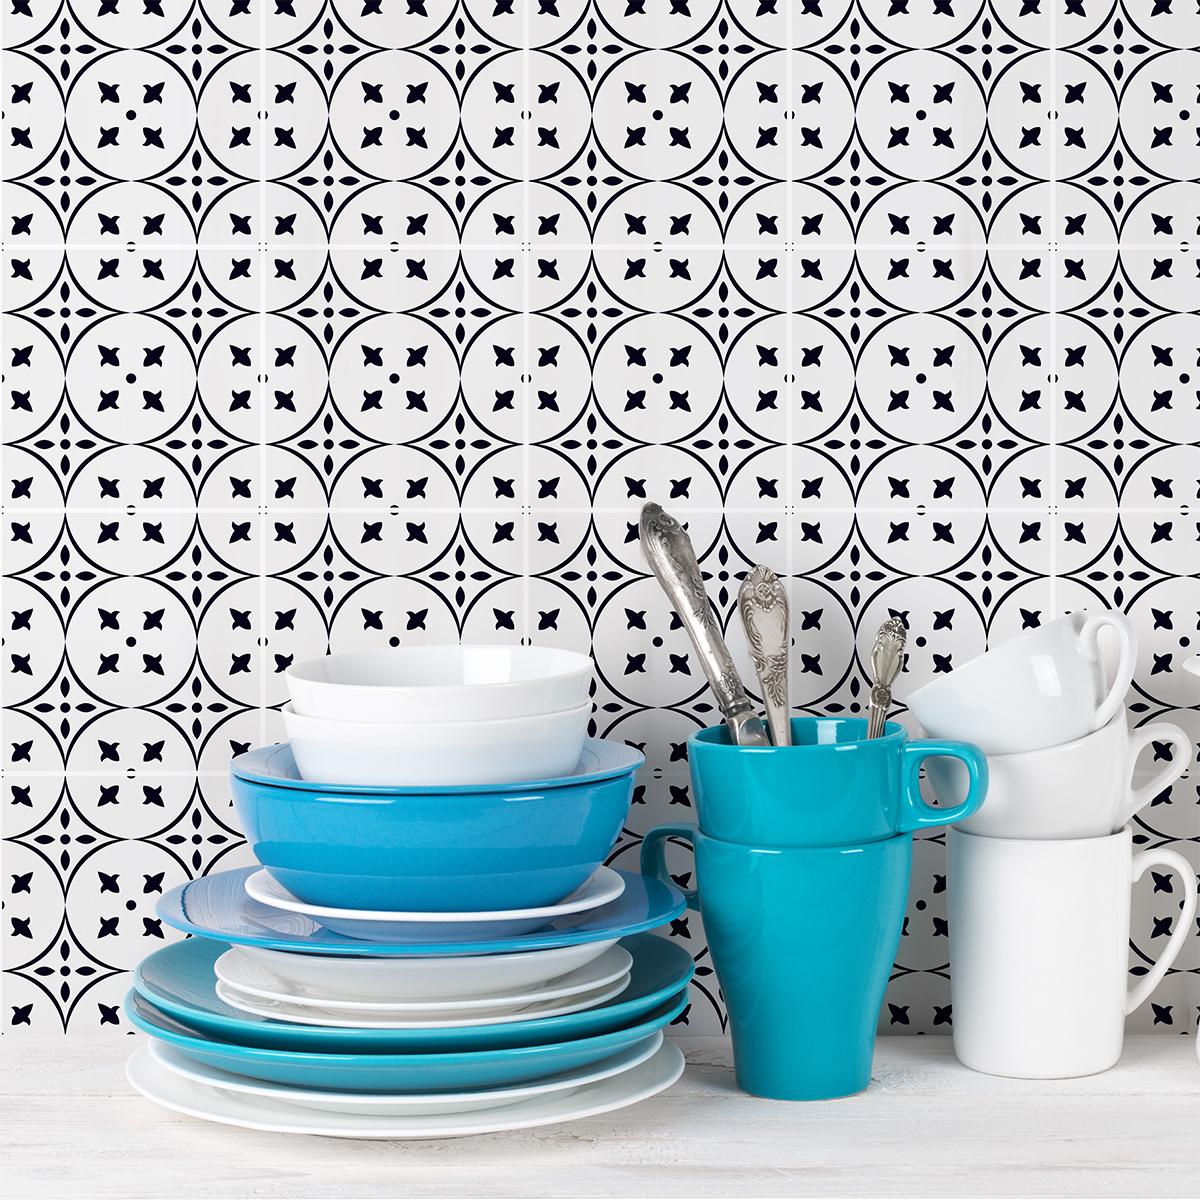 24 stickers carrelages azulejos giulio cuisine for Stickers carrelage 20x20